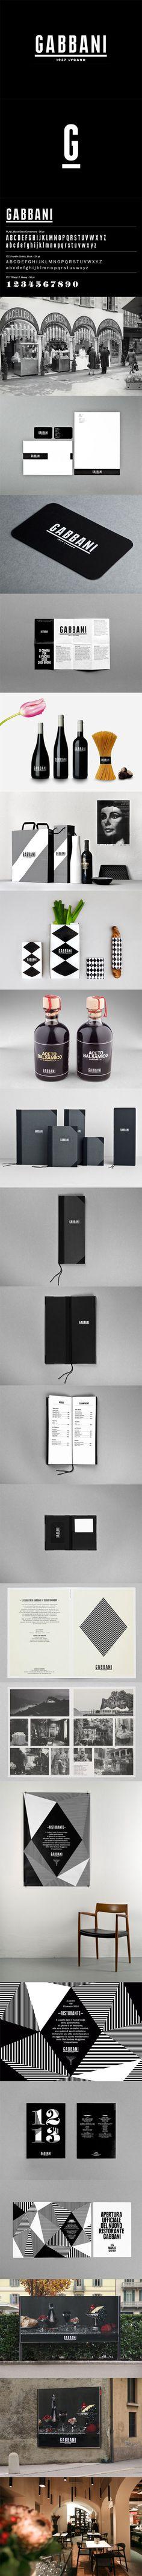 Gabbani @Demian Bellumio Conrad Design. One of my black and white favs #packaging #branding #marketing PD